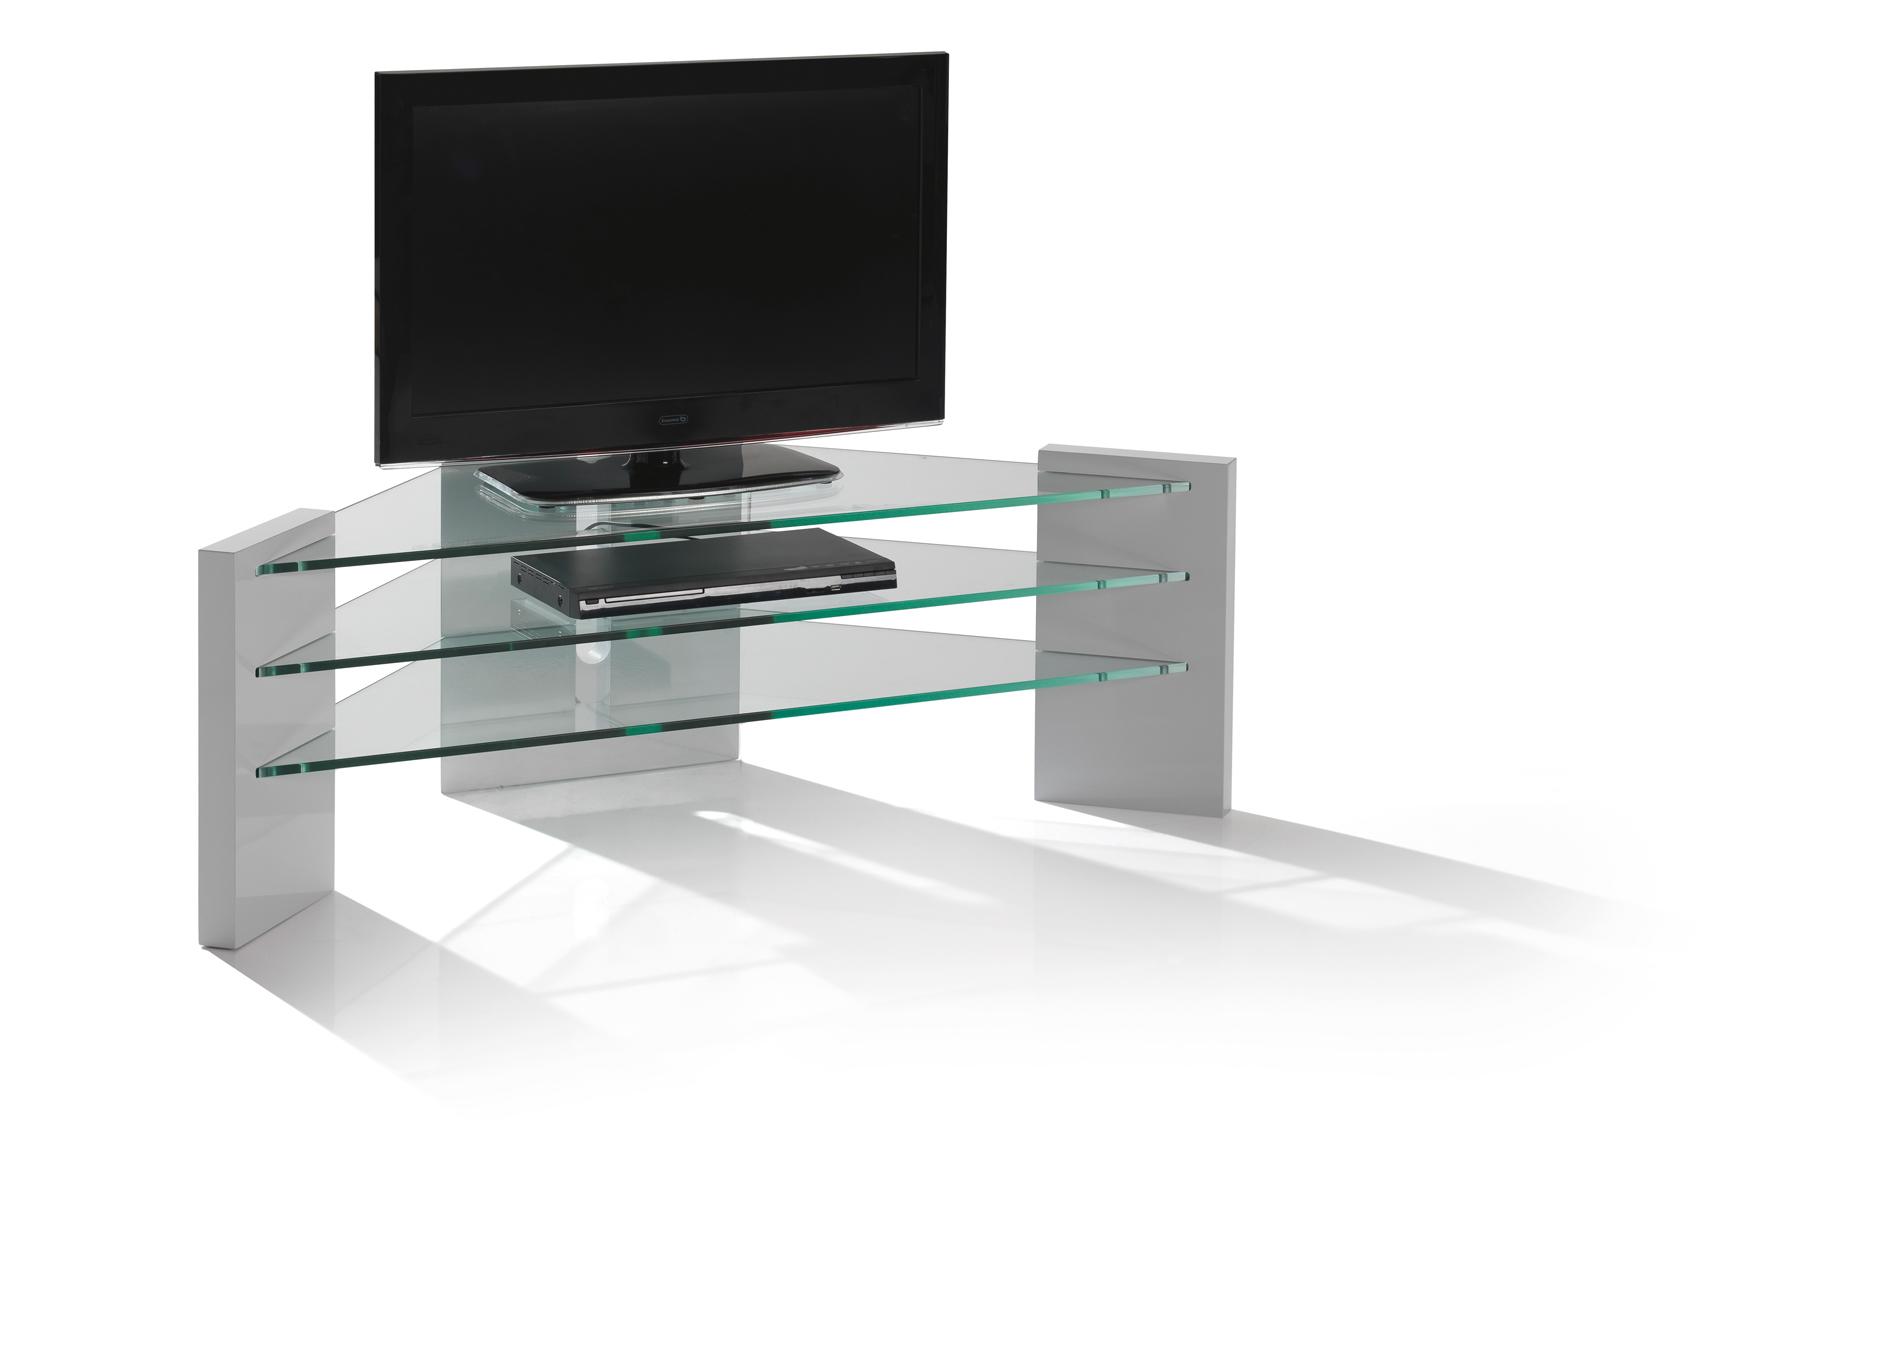 Meuble tv d 39 angle blu ray meubles turone - Meuble rangement blu ray ...